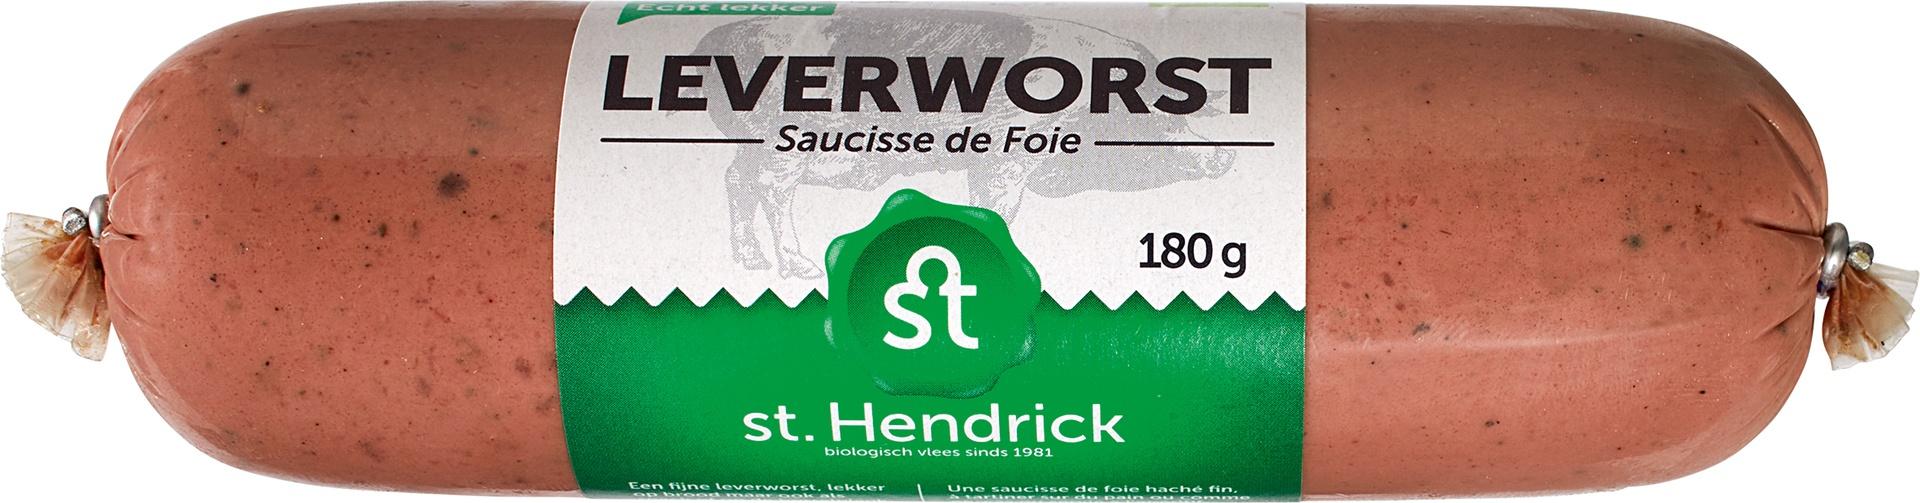 Biologische St. Hendrick Leverworst 180 gr